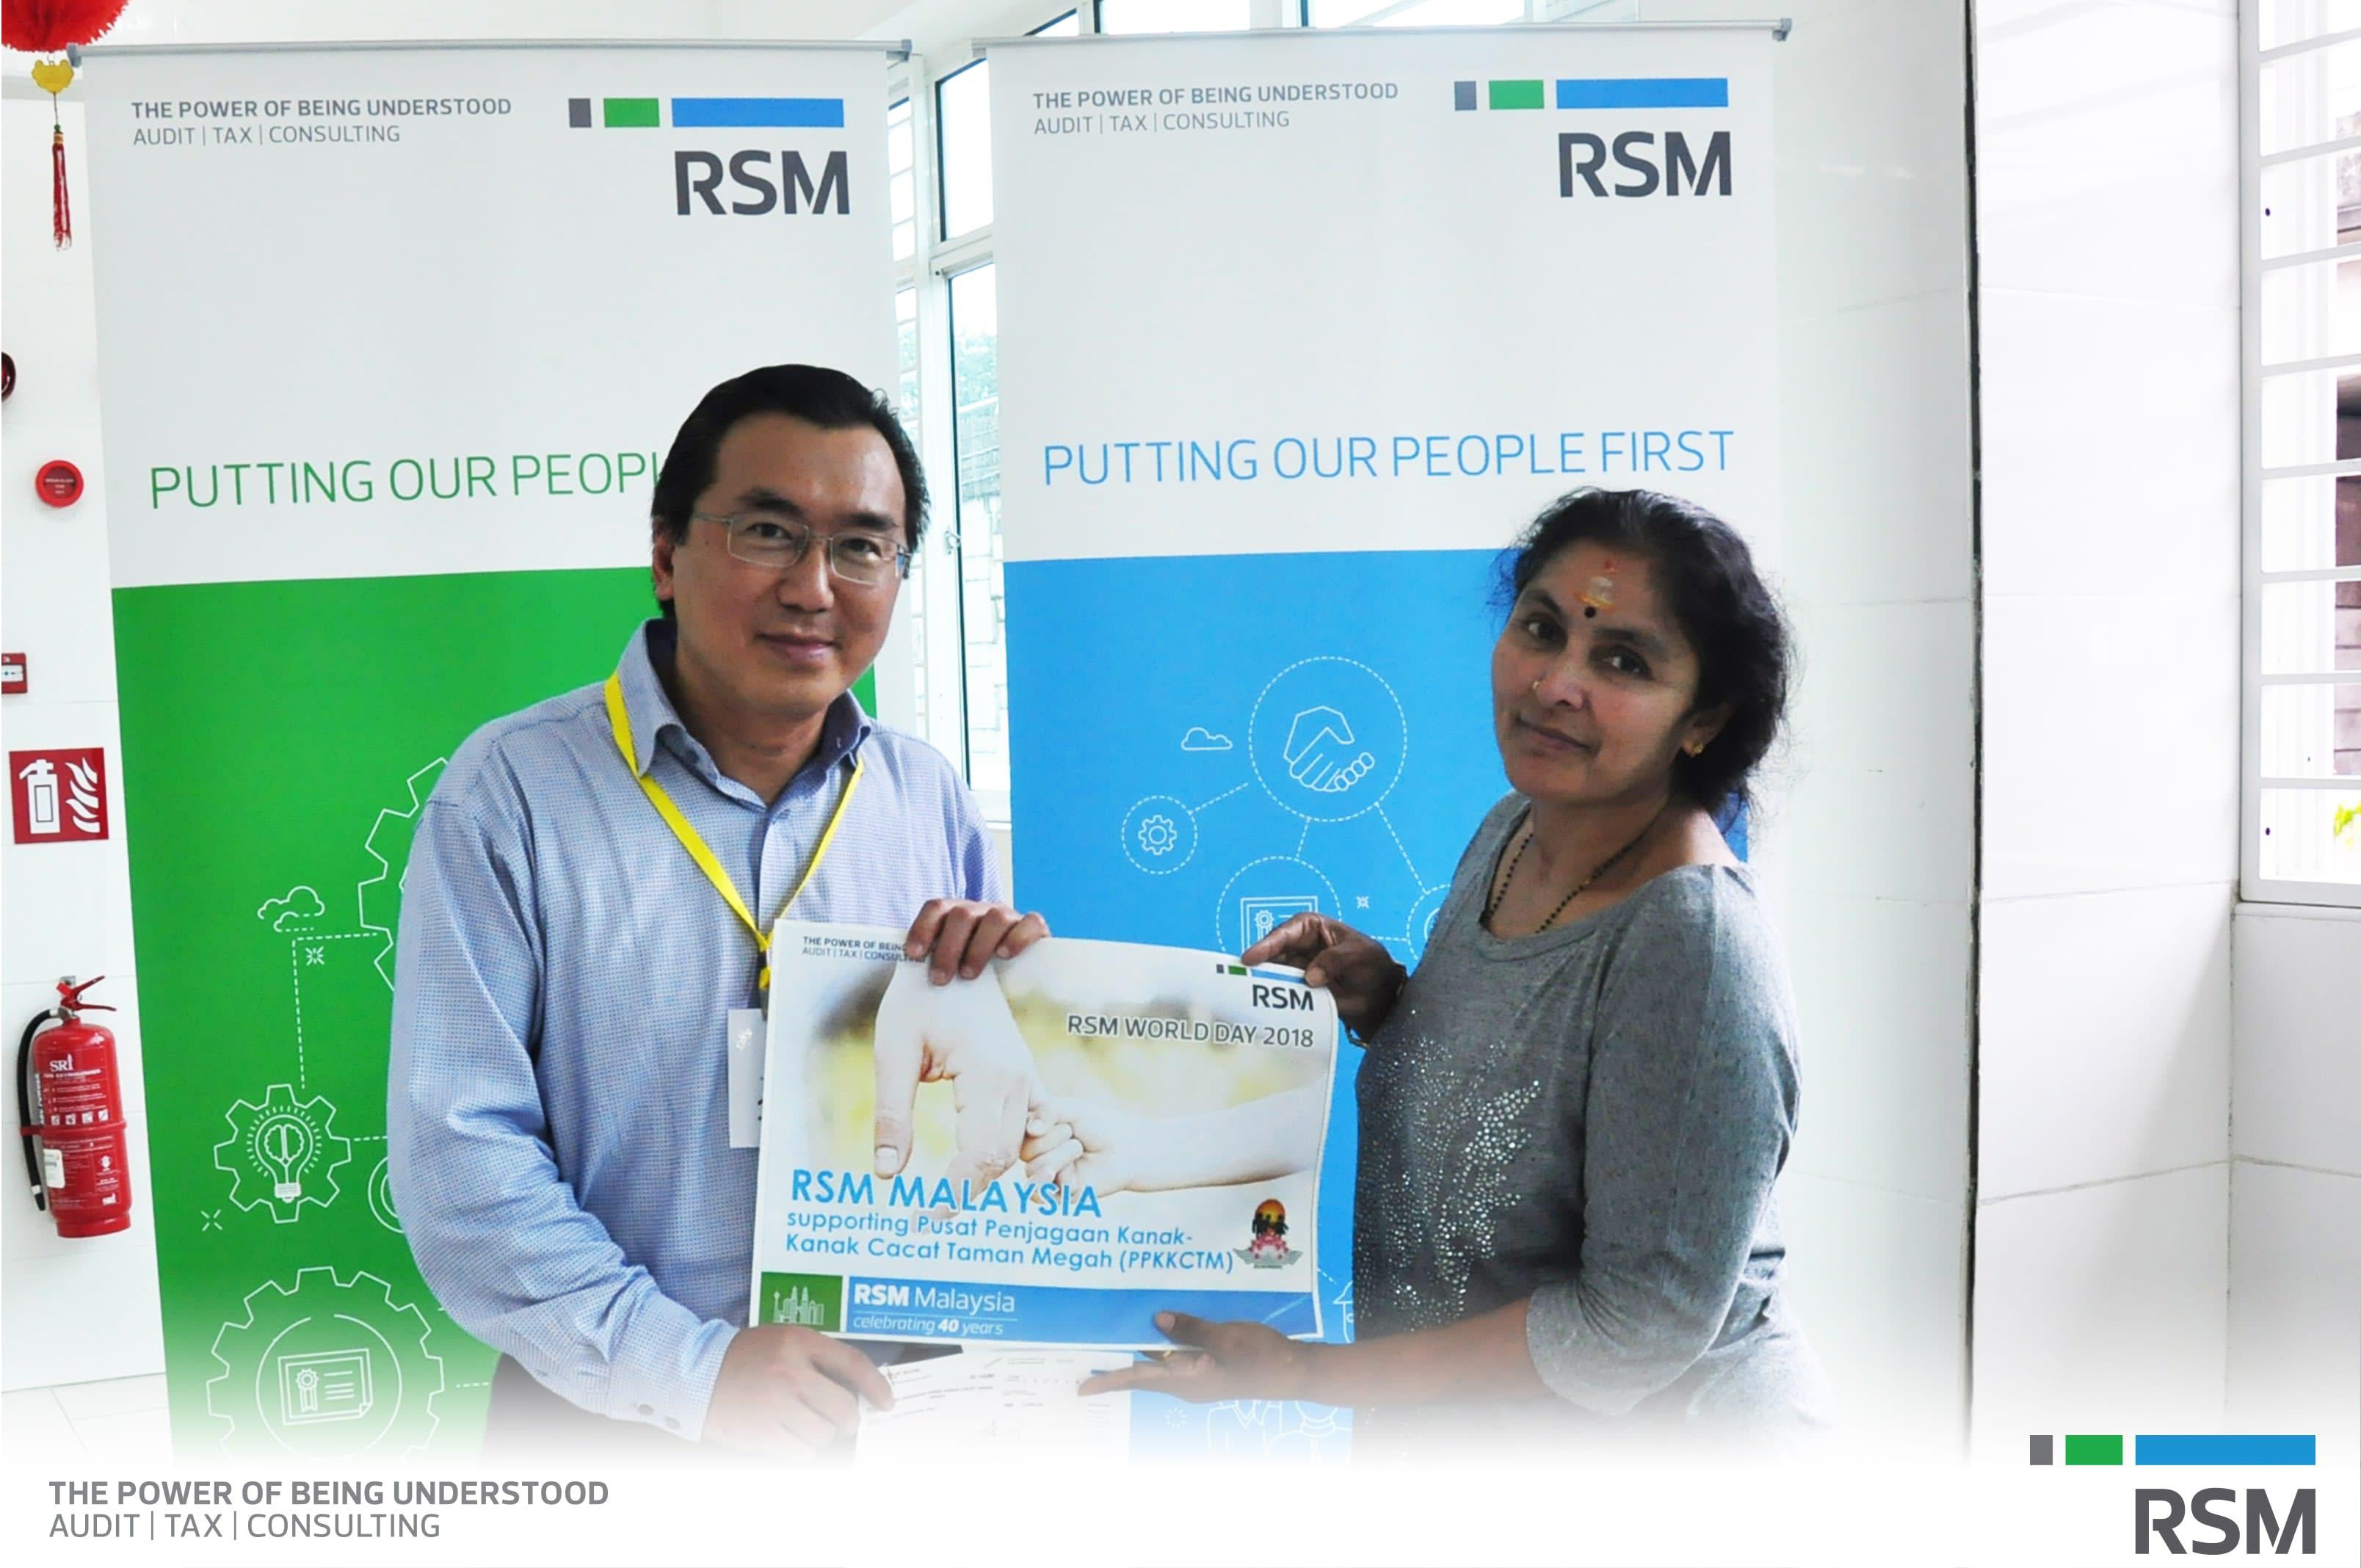 rsm_charityvisit90-min.jpg